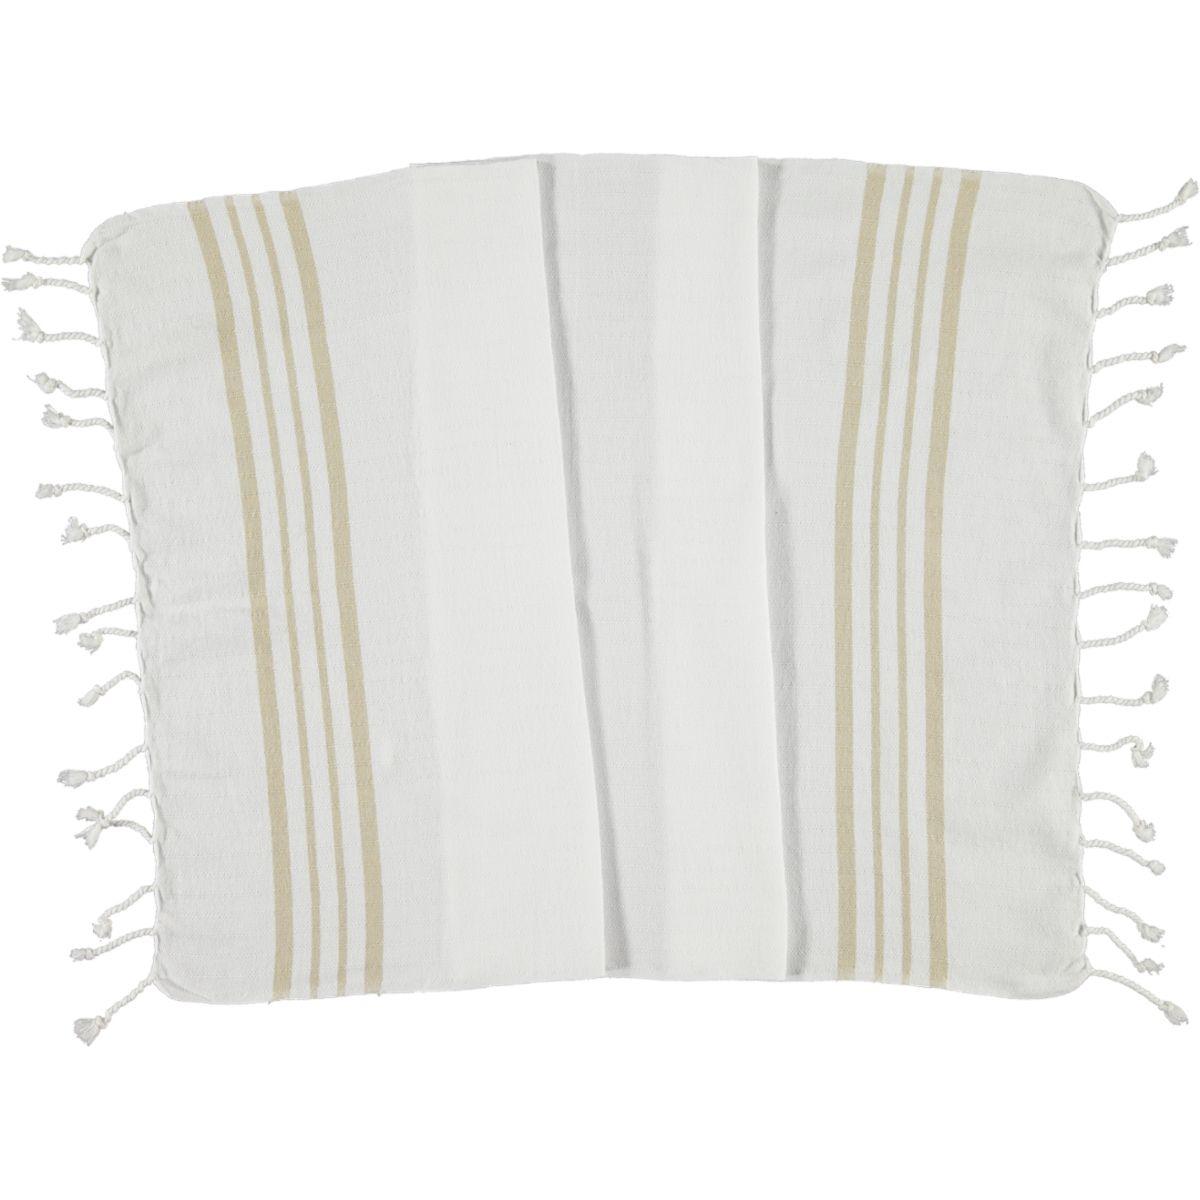 Peshkir - White Sultan / Beige Stripes